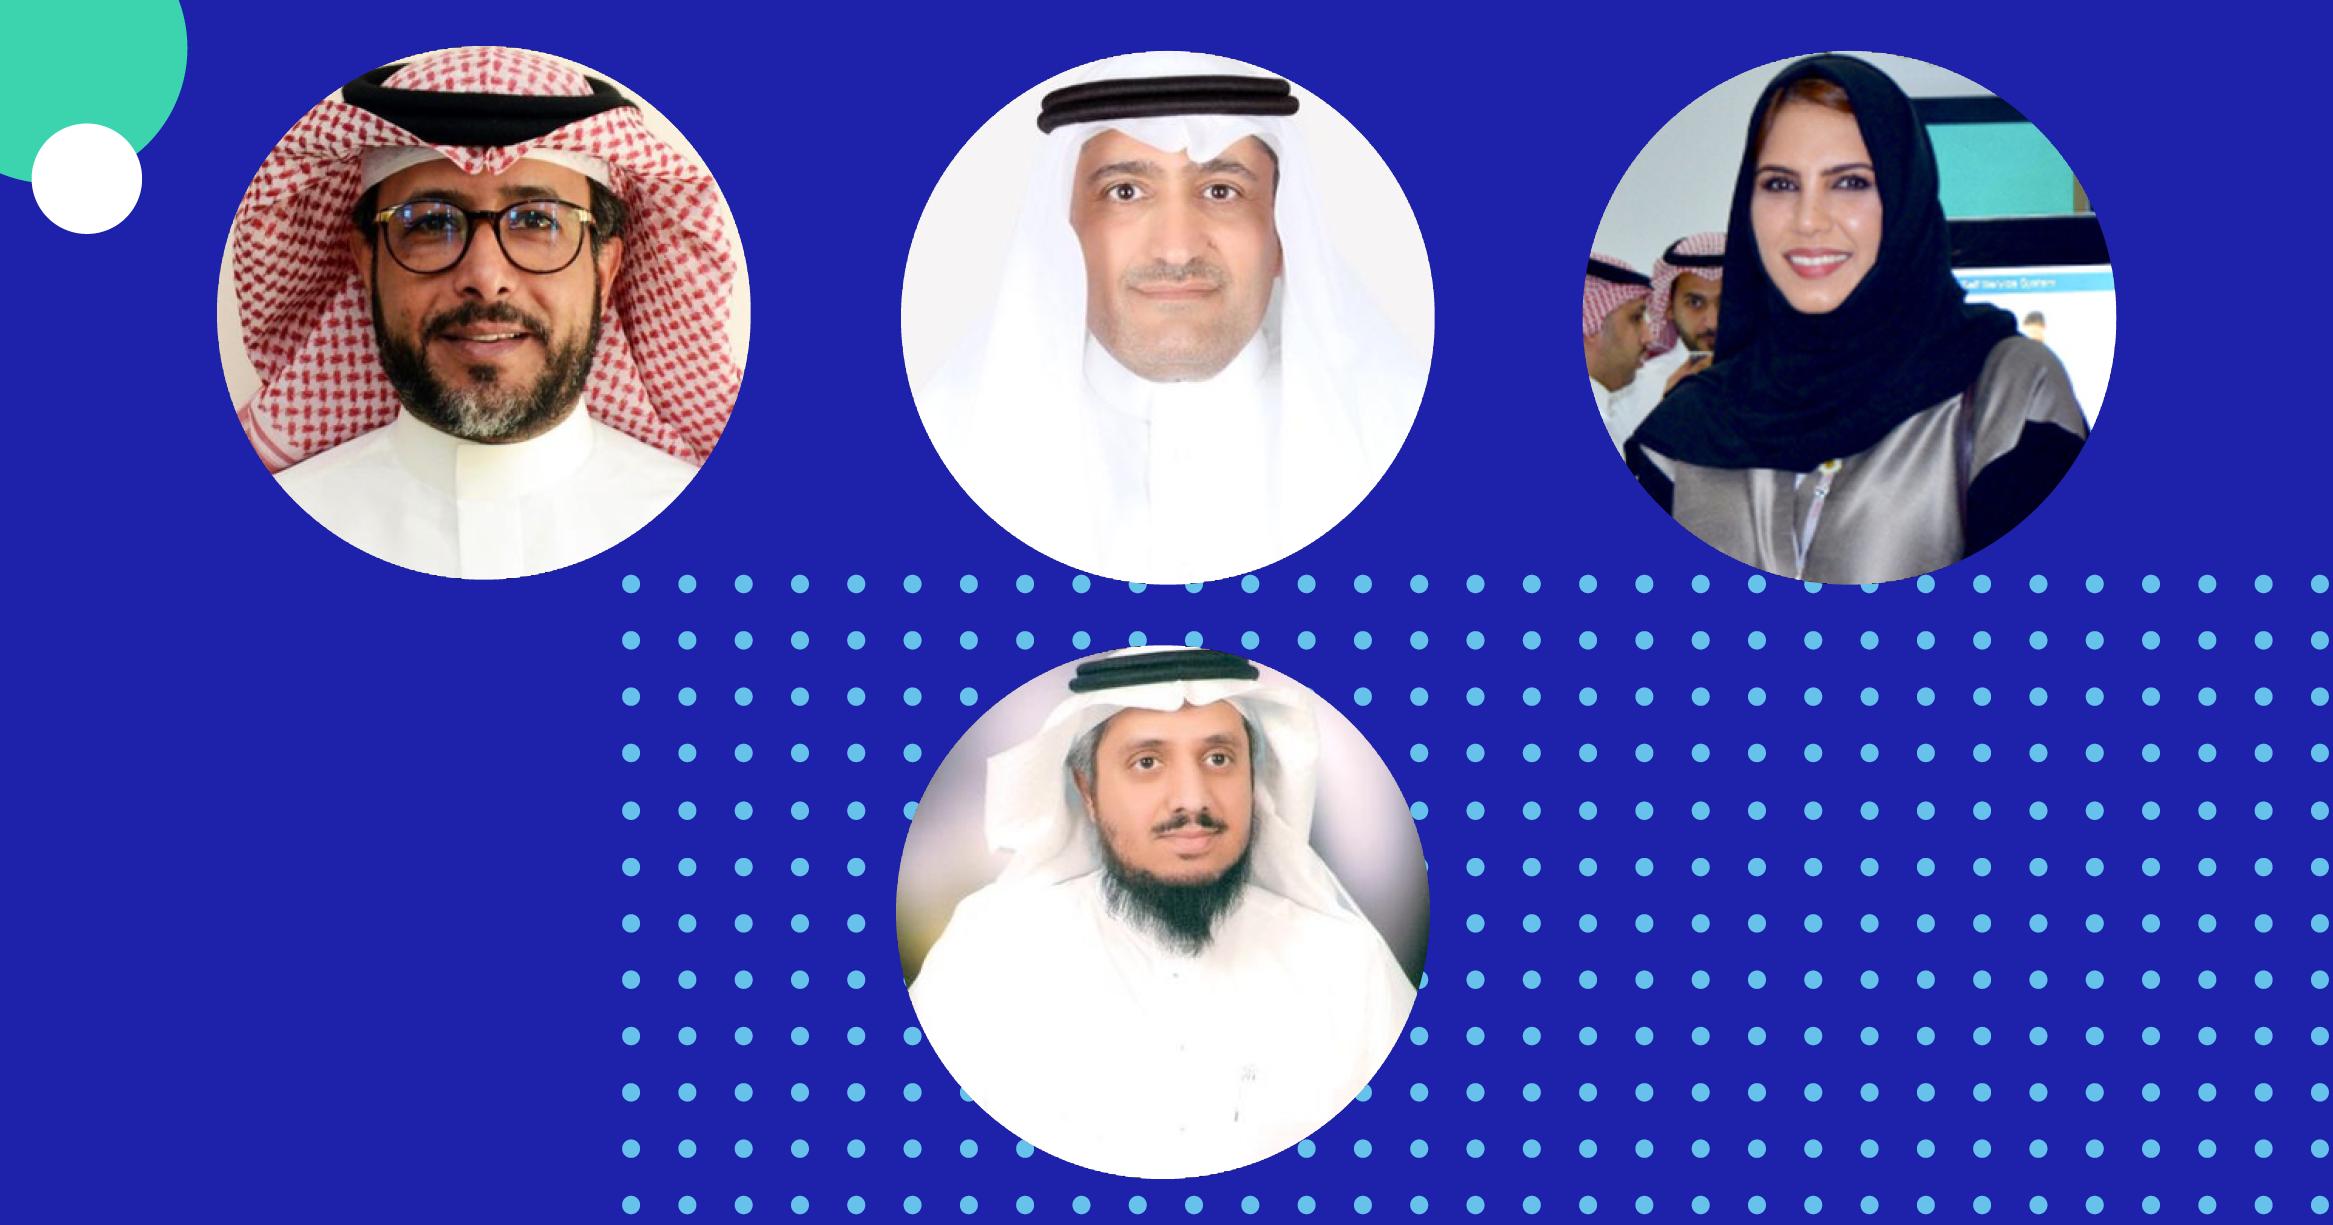 HIMSS & Health 2.0 Middle East, Saudi Arabia Vision 2030